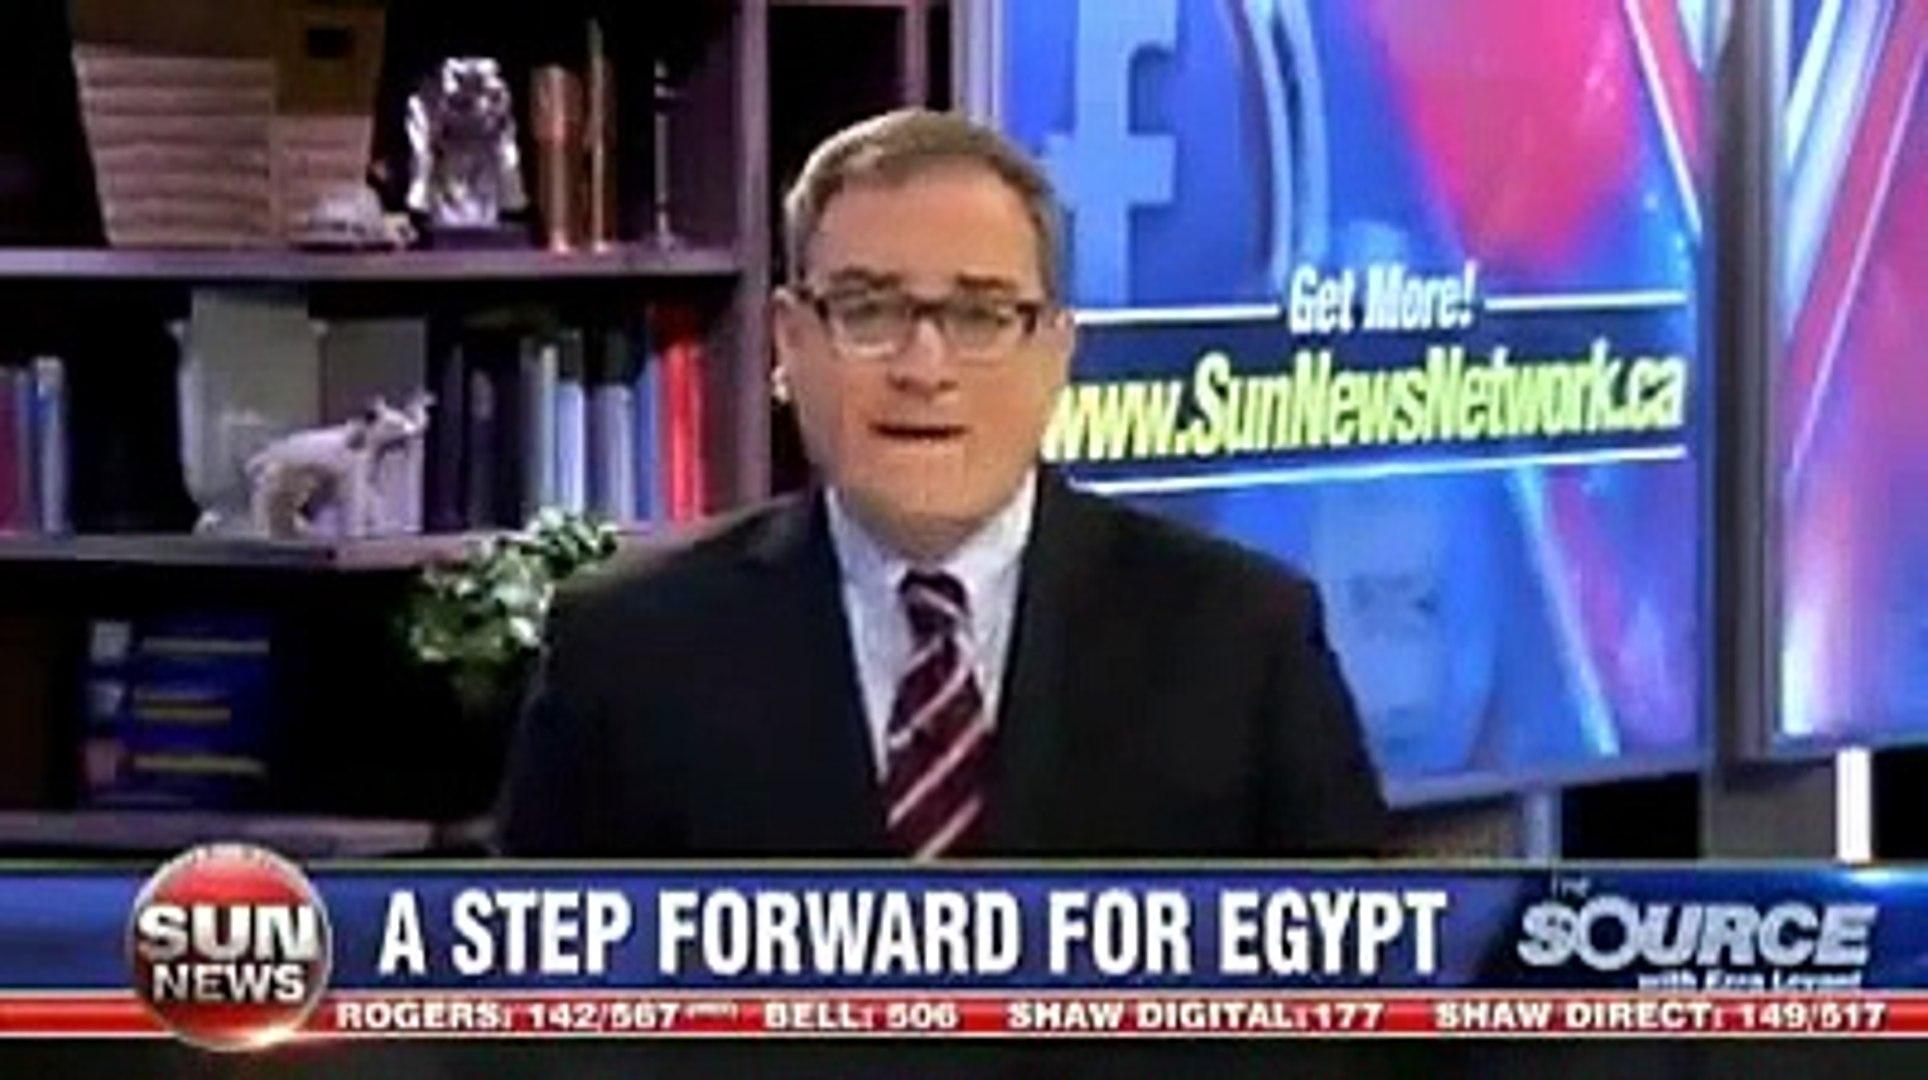 Sisi's Historic speech and religious revolution'